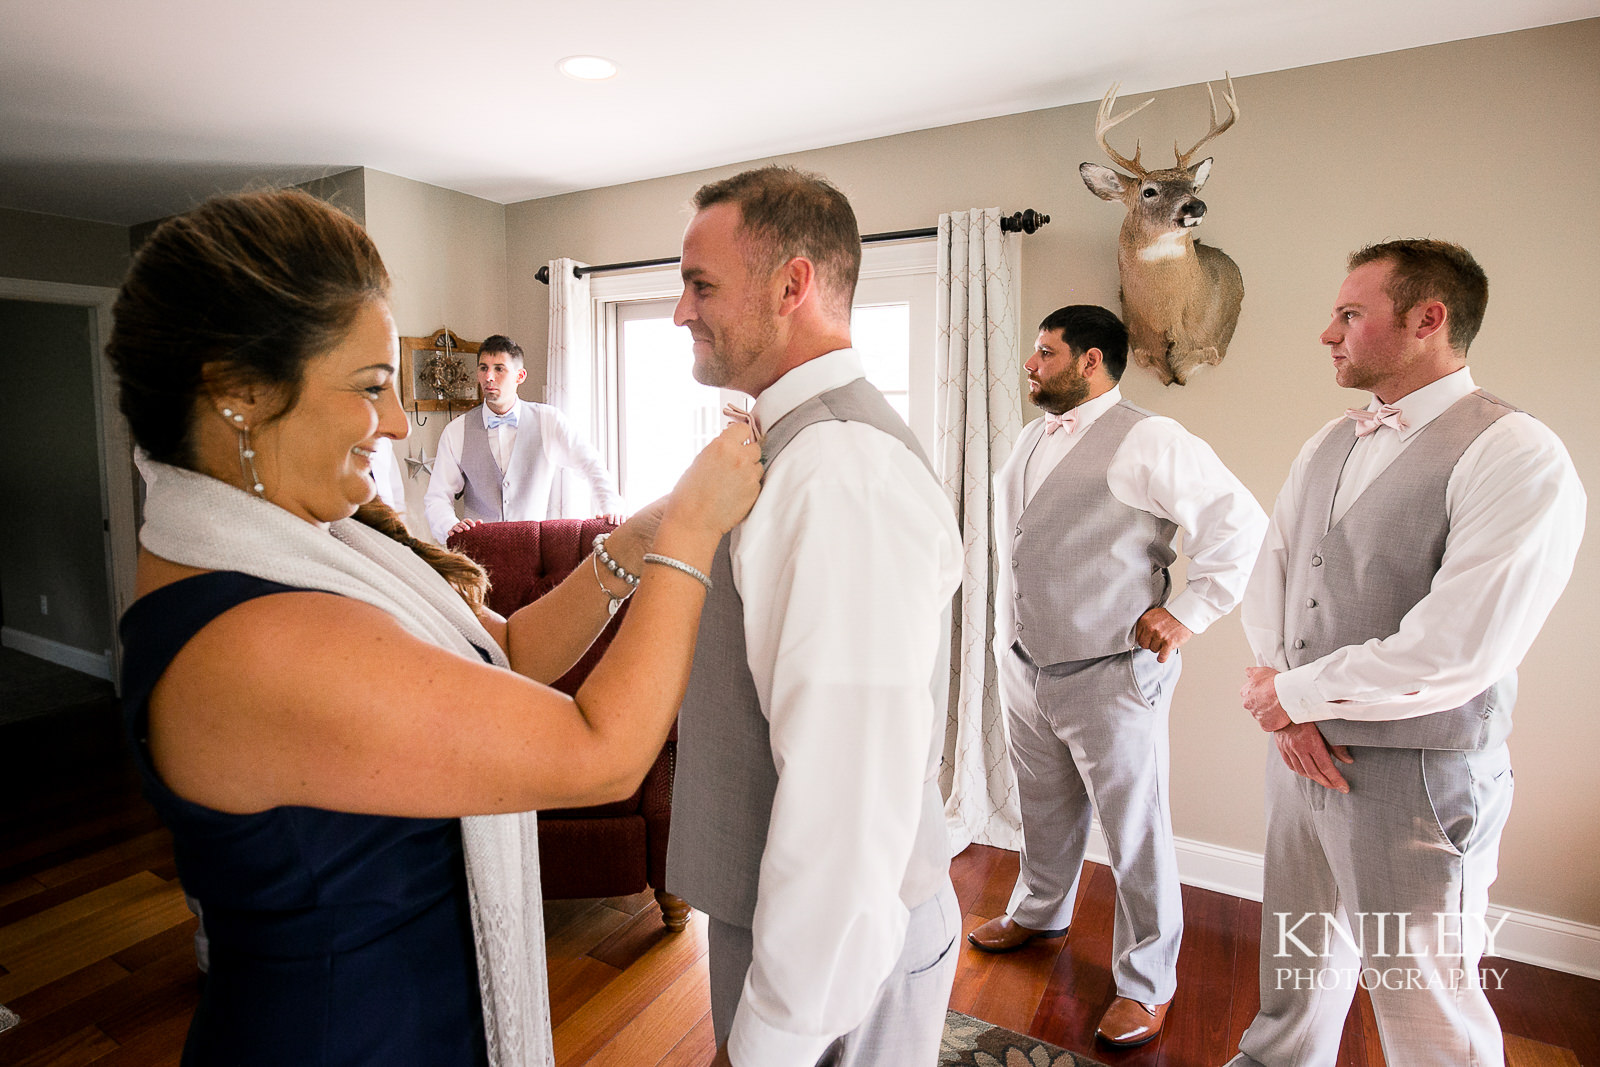 040 - Buffalo NY wedding - Preparation pictures - IMG_7388.jpg